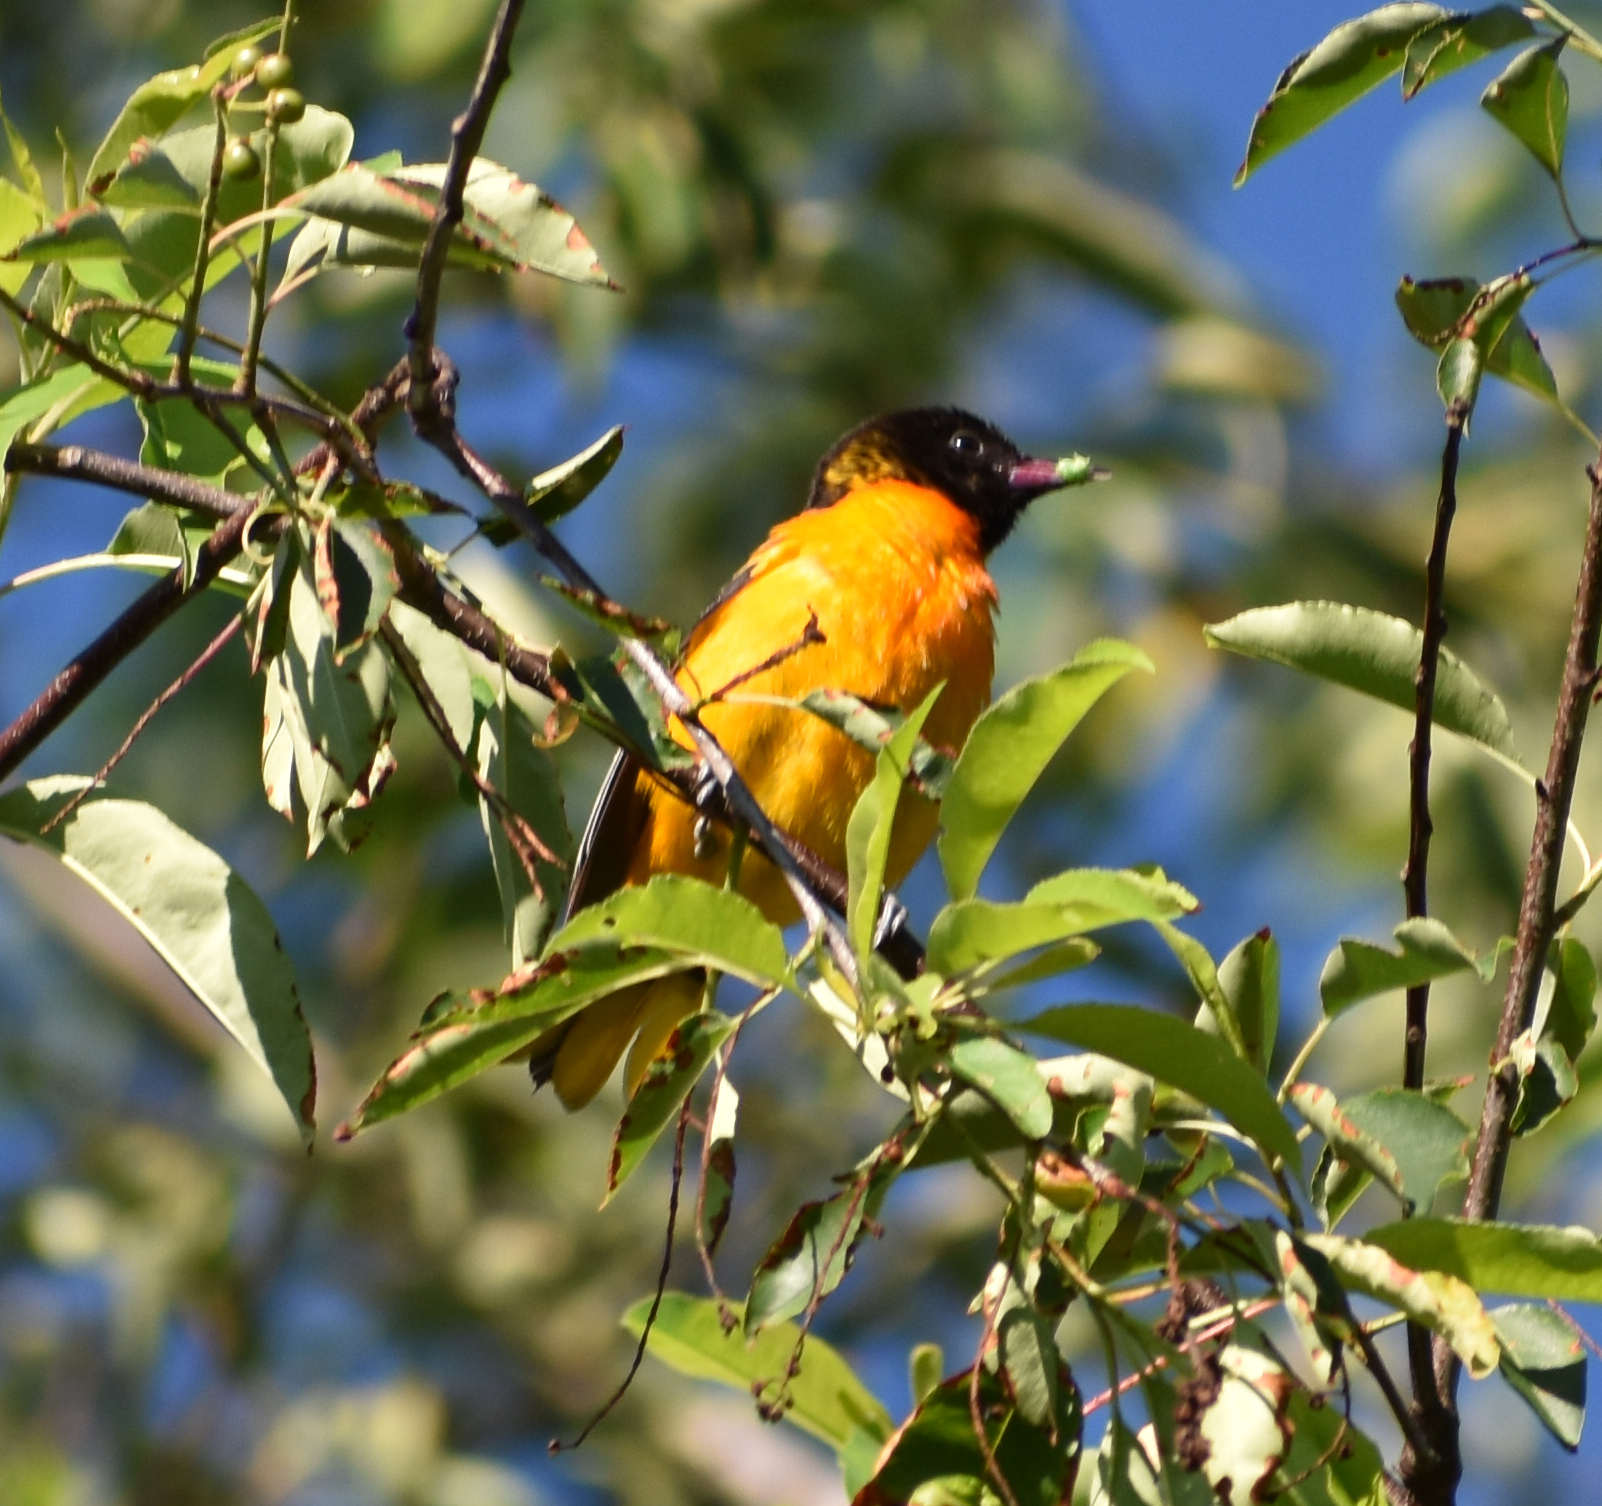 Baltimore Oriole eating caterpillar in Wild Cherry